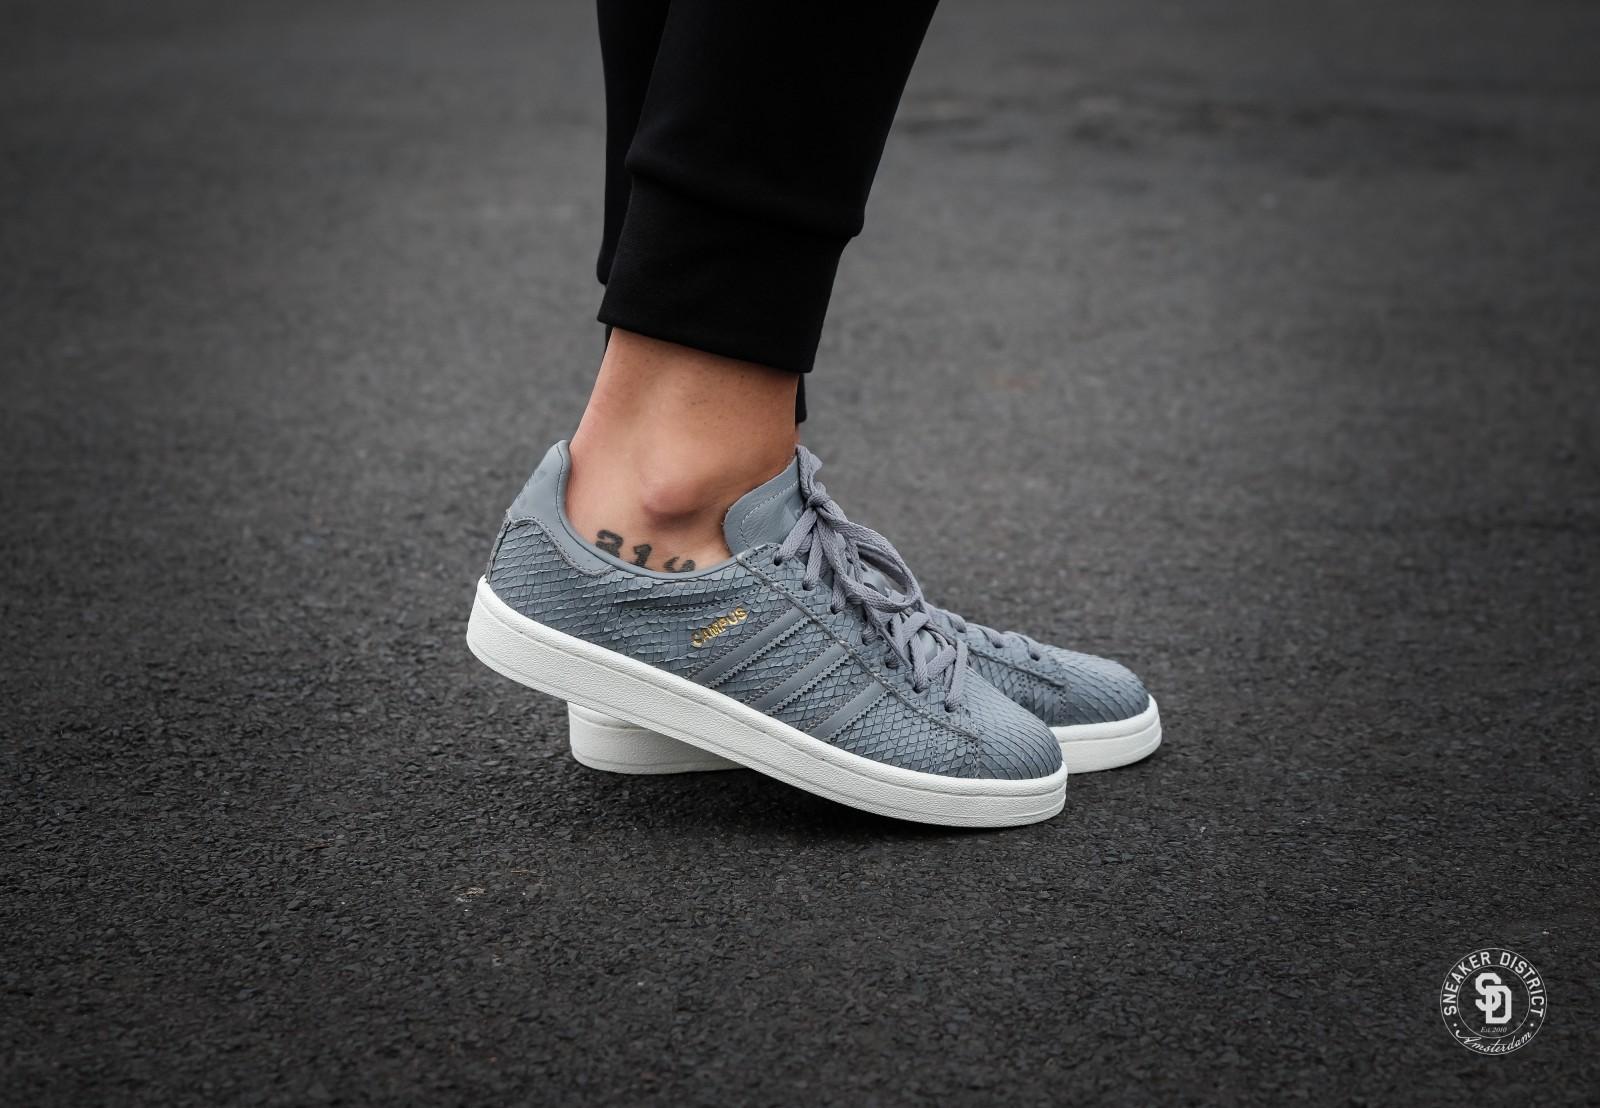 Adidas Women's Campus Grey/White